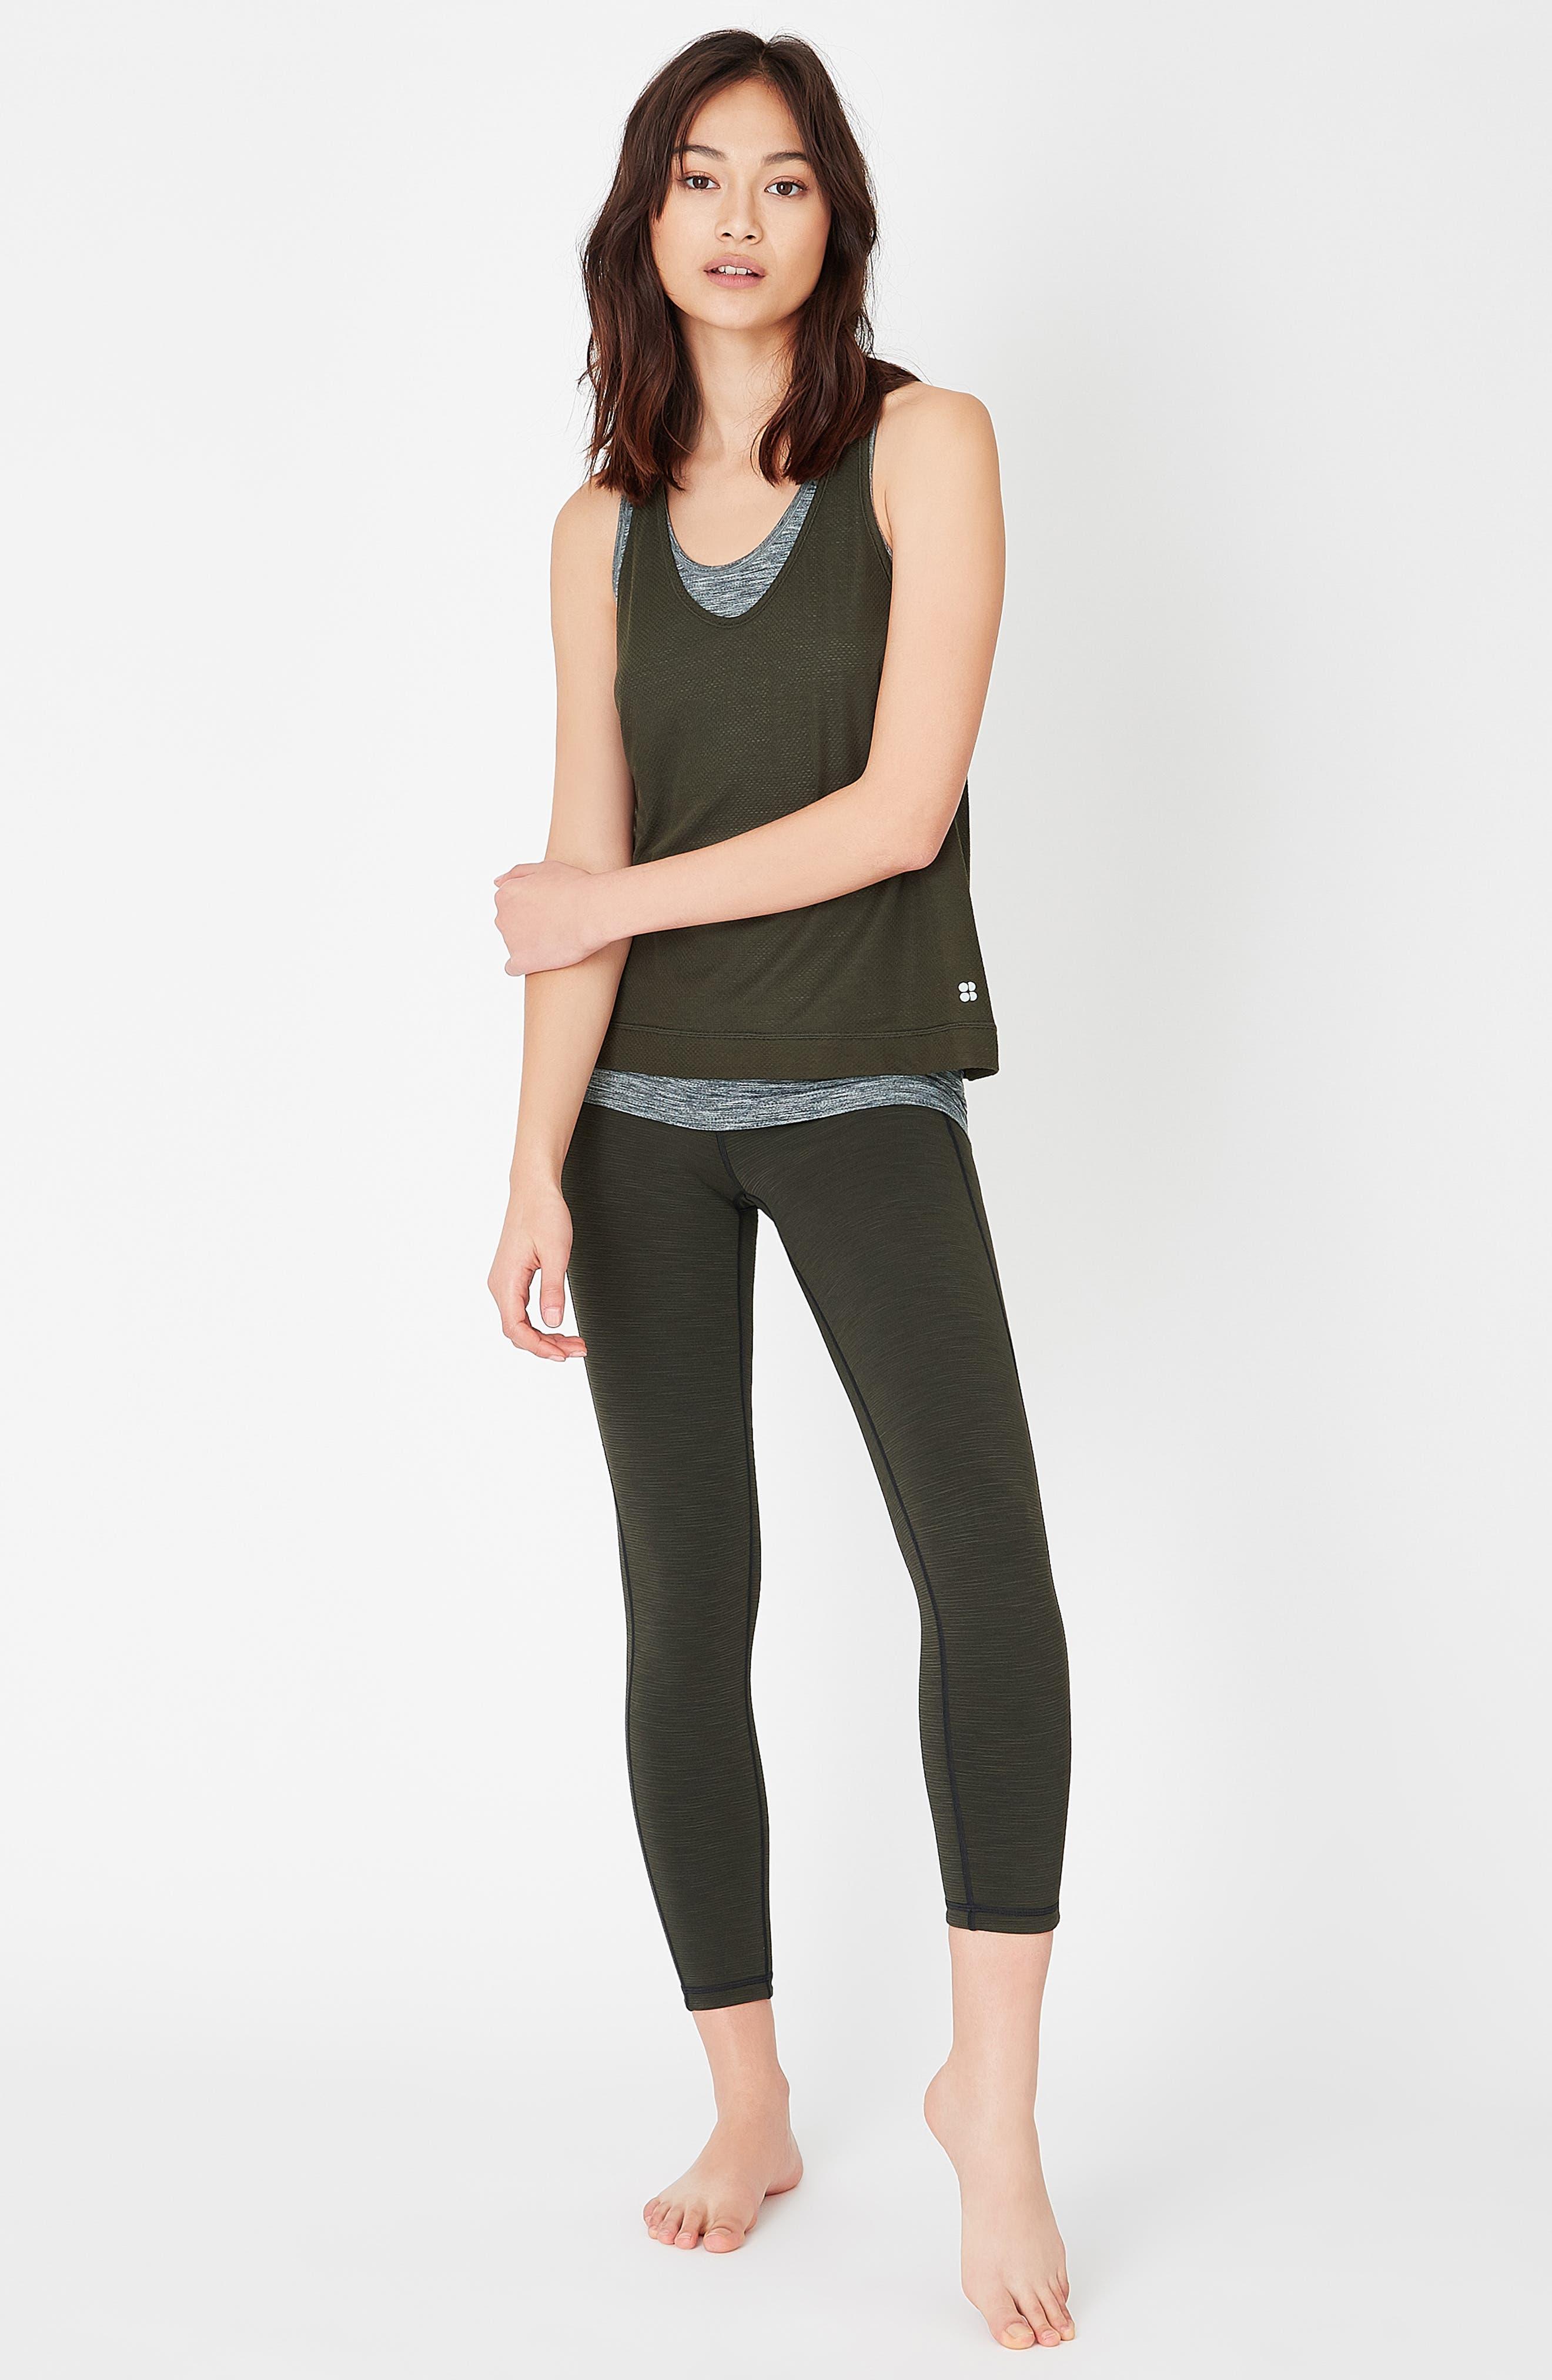 SWEATY BETTY, Reversible Yoga Leggings, Alternate thumbnail 6, color, 300